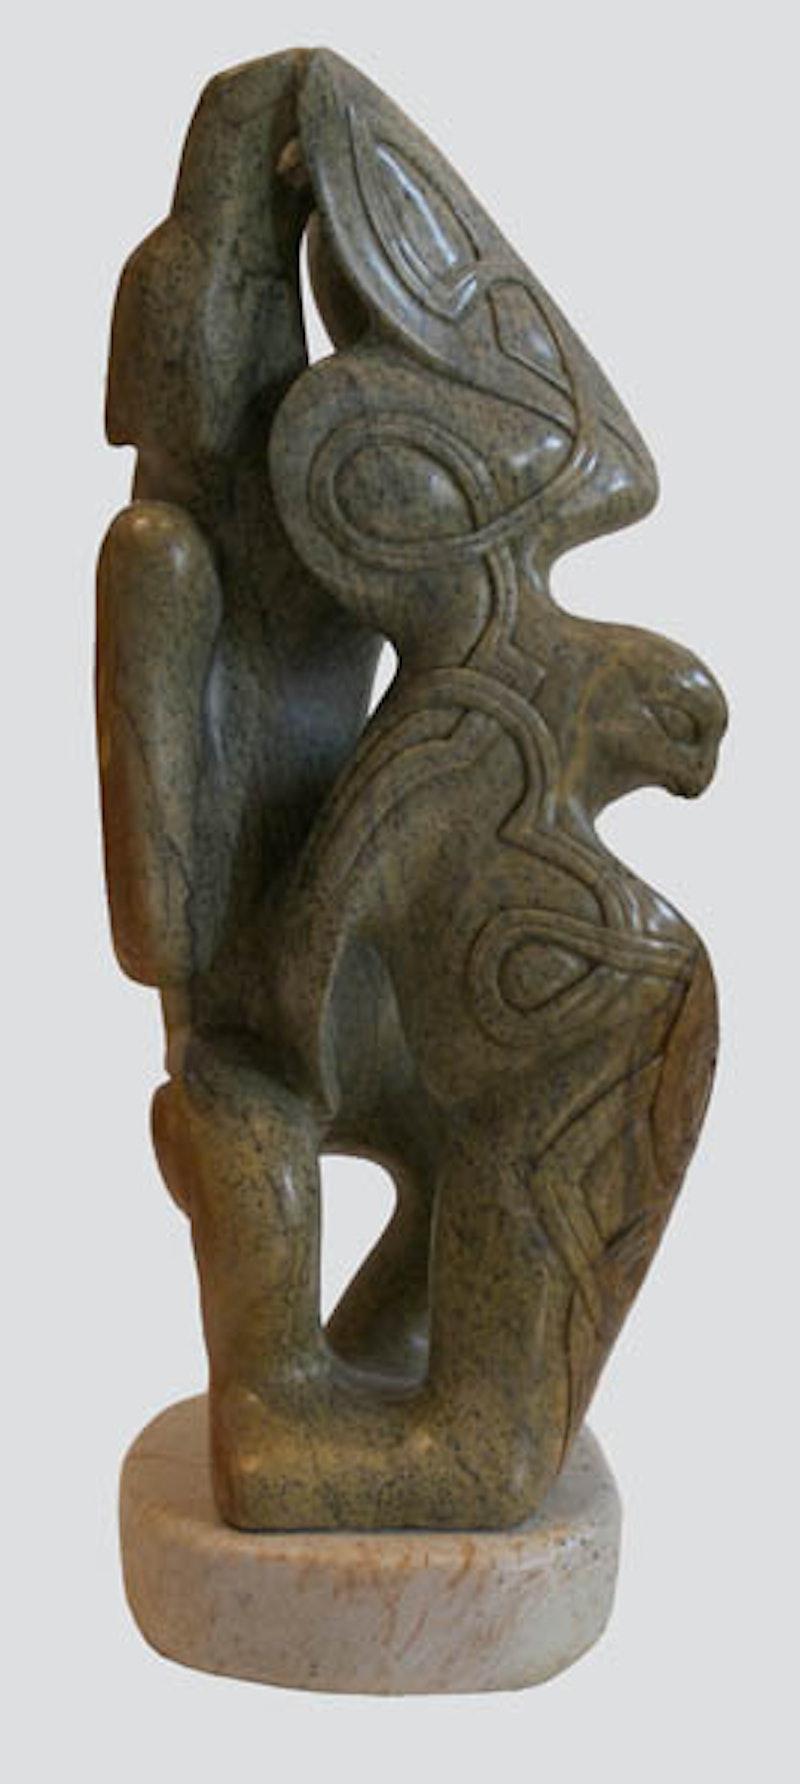 Nordic Bear and Falcon Image 1